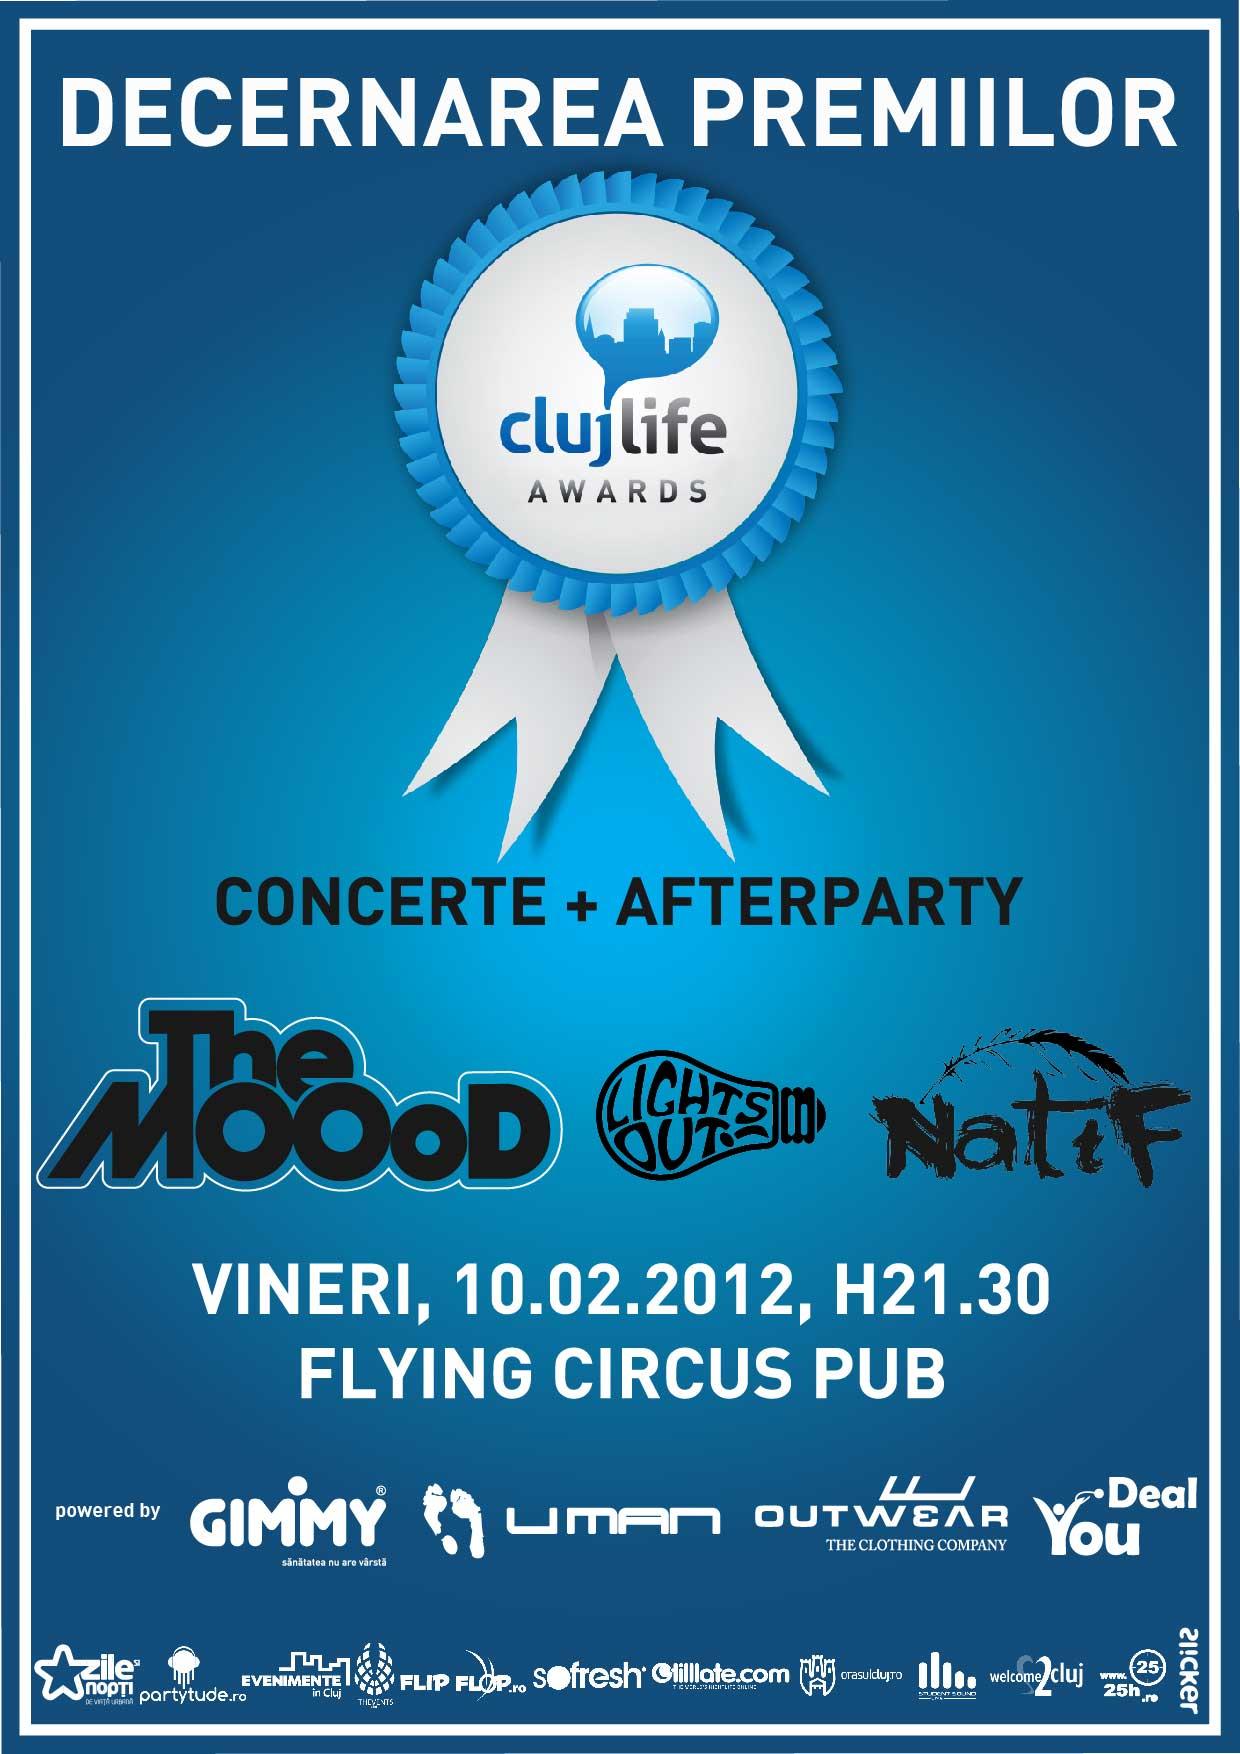 ClujLife Awards – decernarea premiilor @ Flying Circus Pub